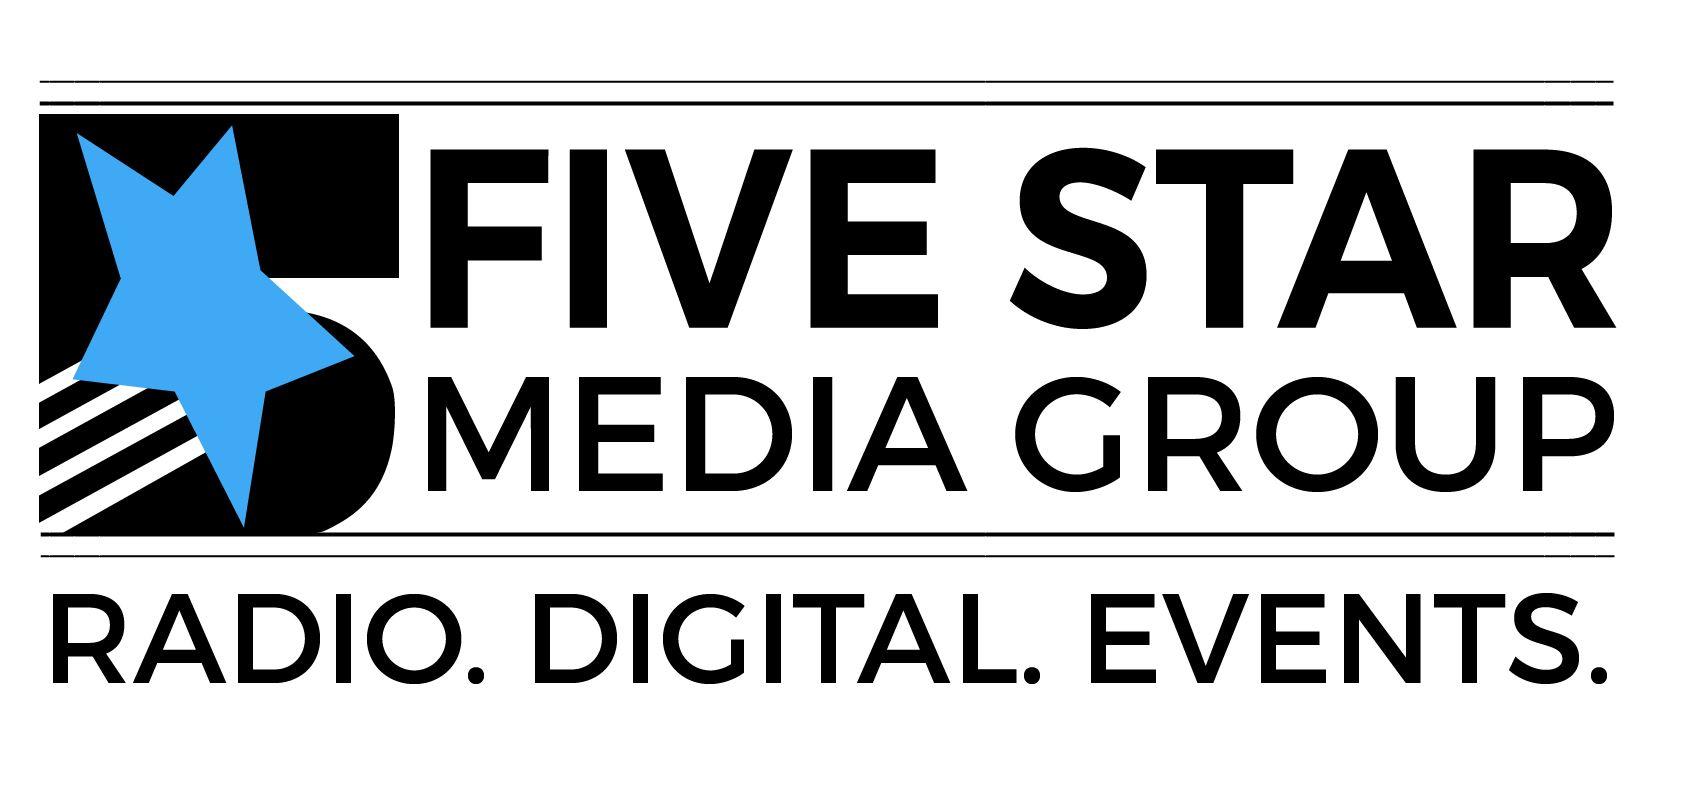 5 Star Media Group